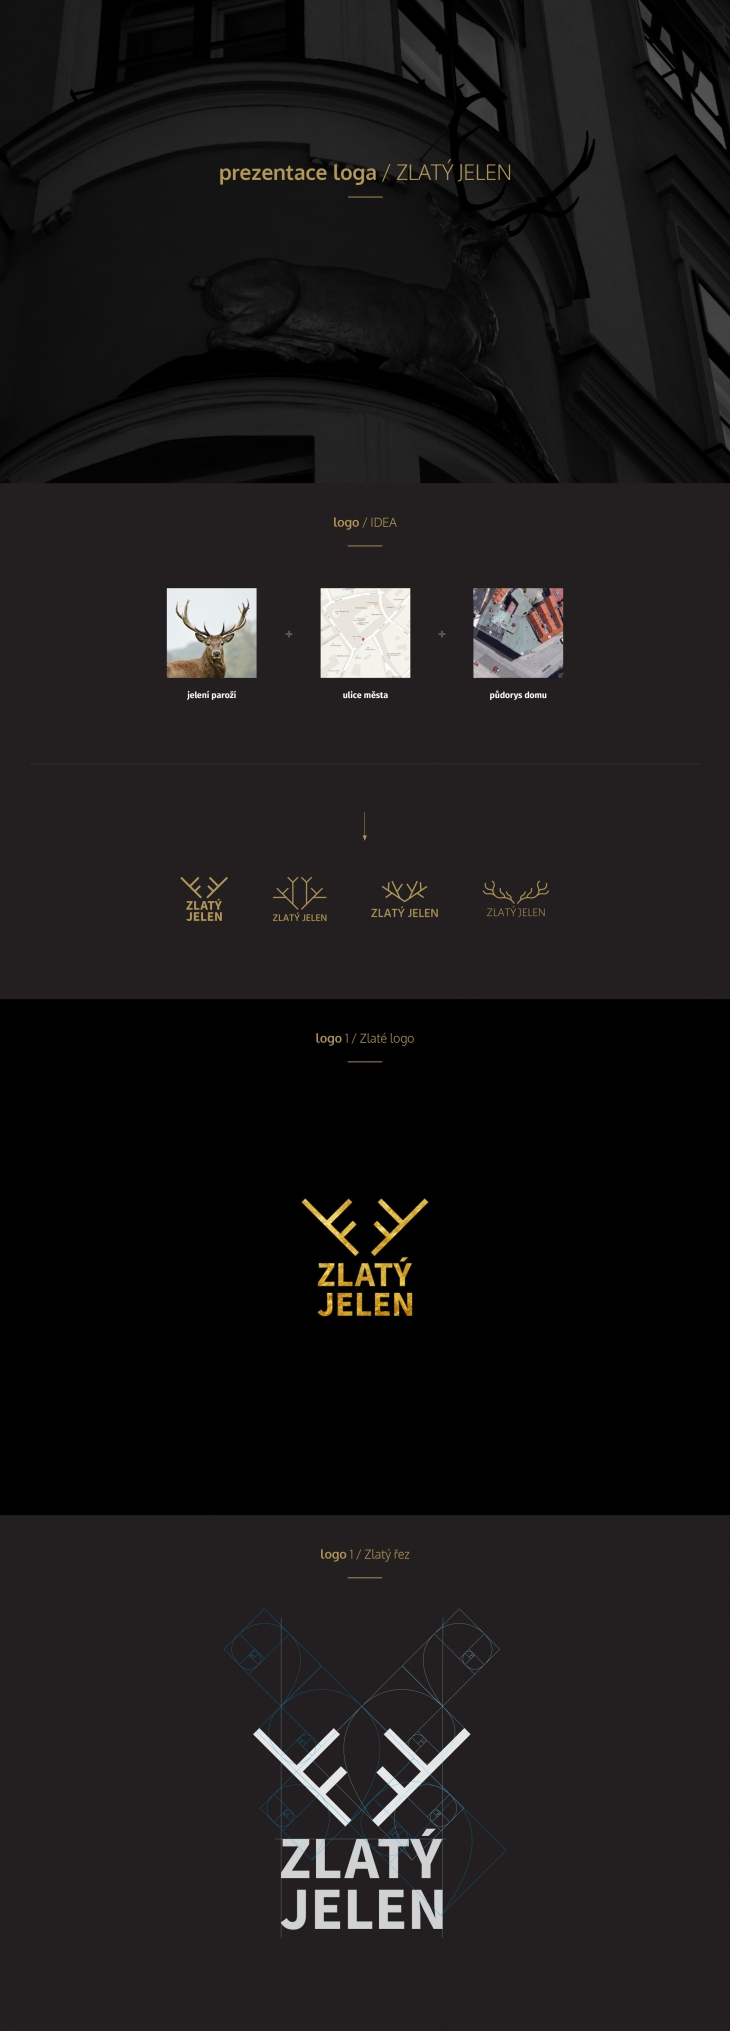 Projekt: Zlatý Jelen